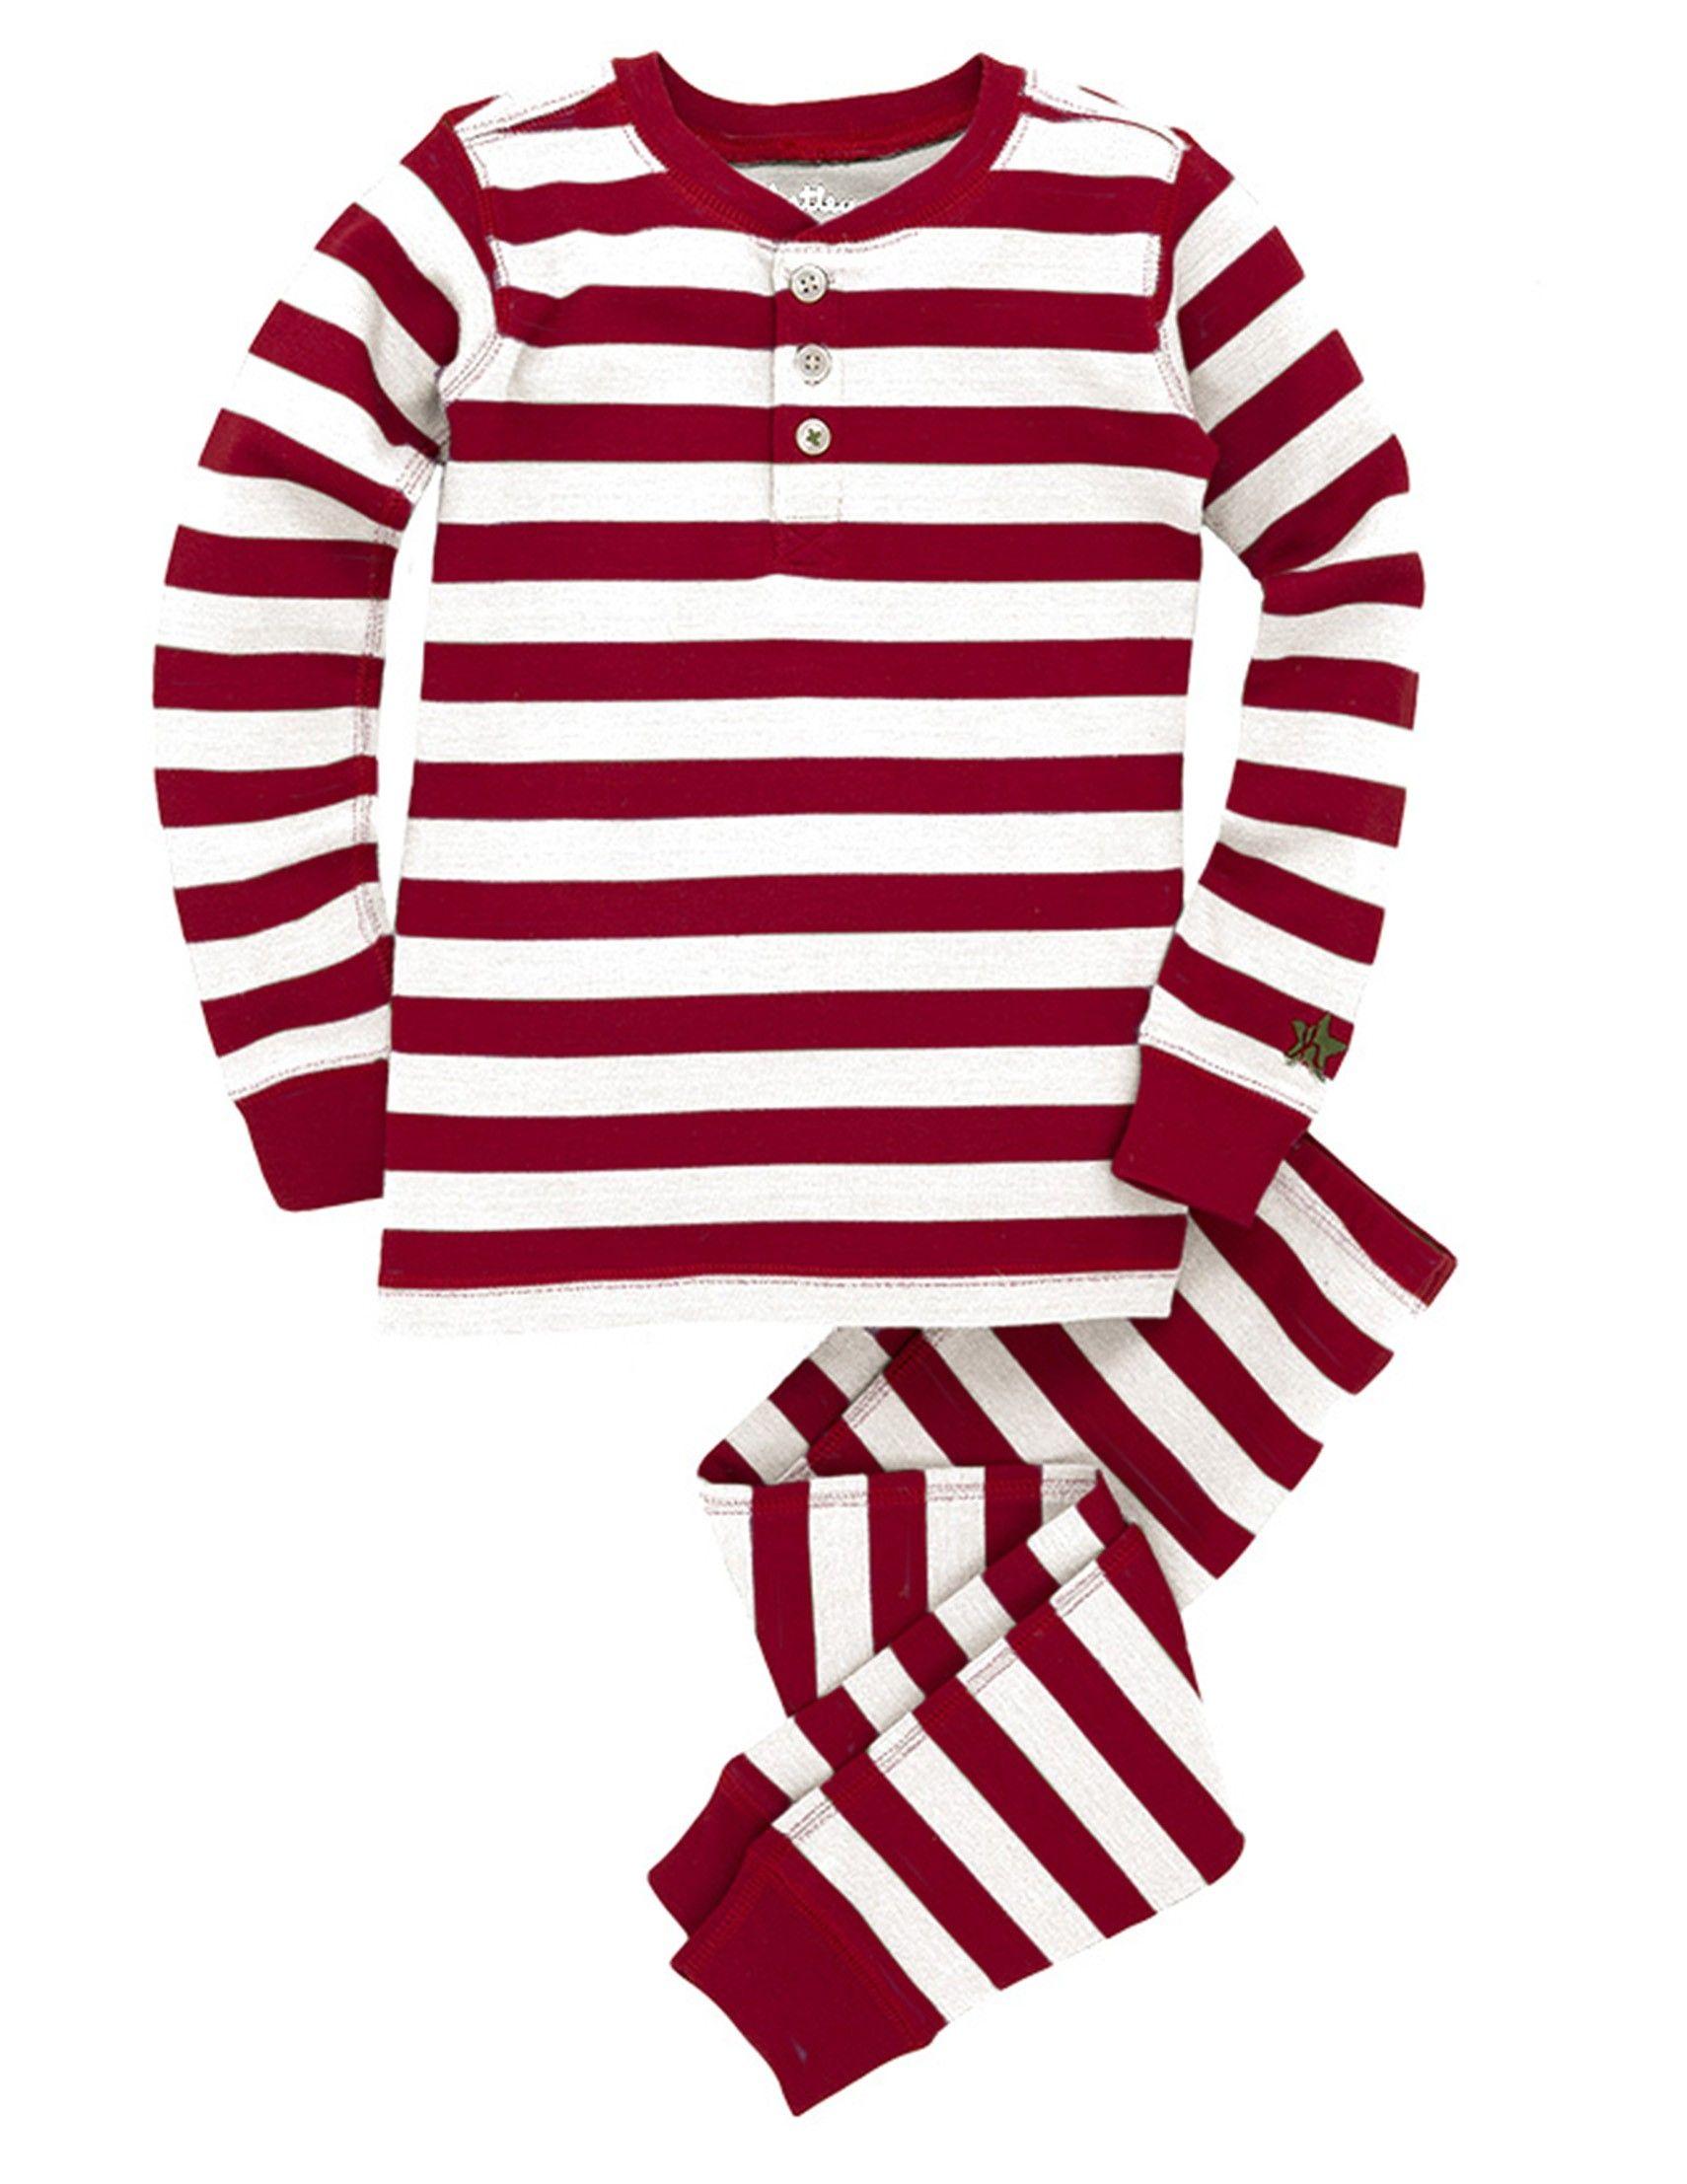 Candy Cane Stripes Kids' Overall Print Pajama Set Online